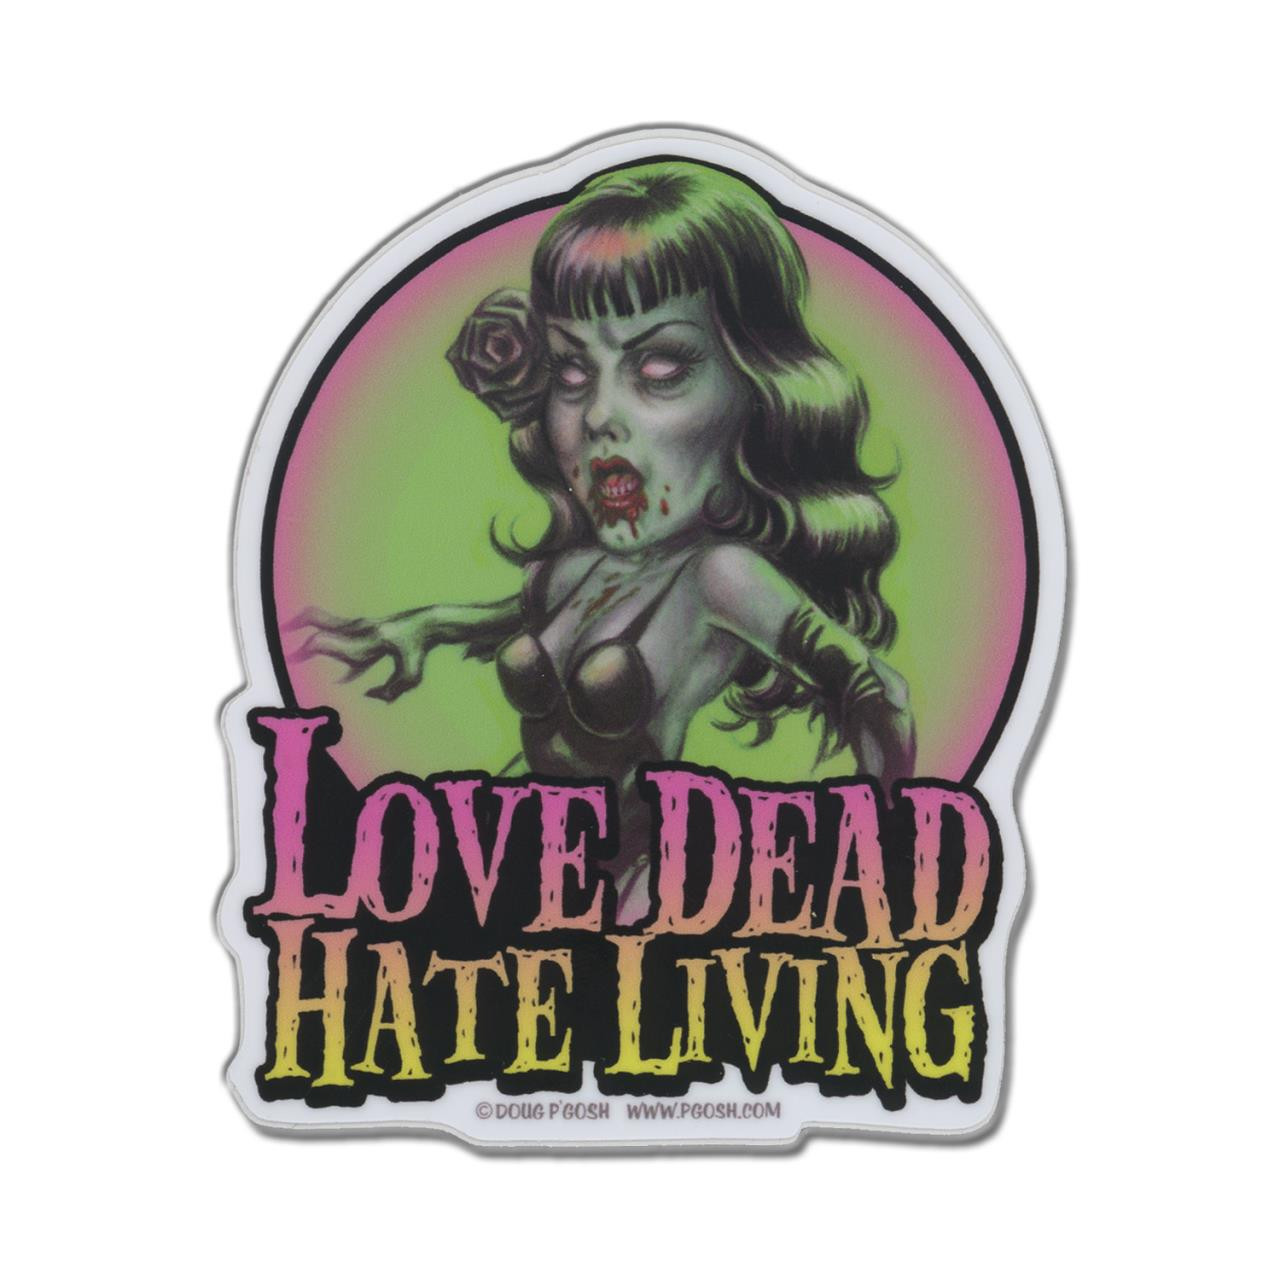 P'gosh Love Dead Hate Living Vinyl Sticker* -